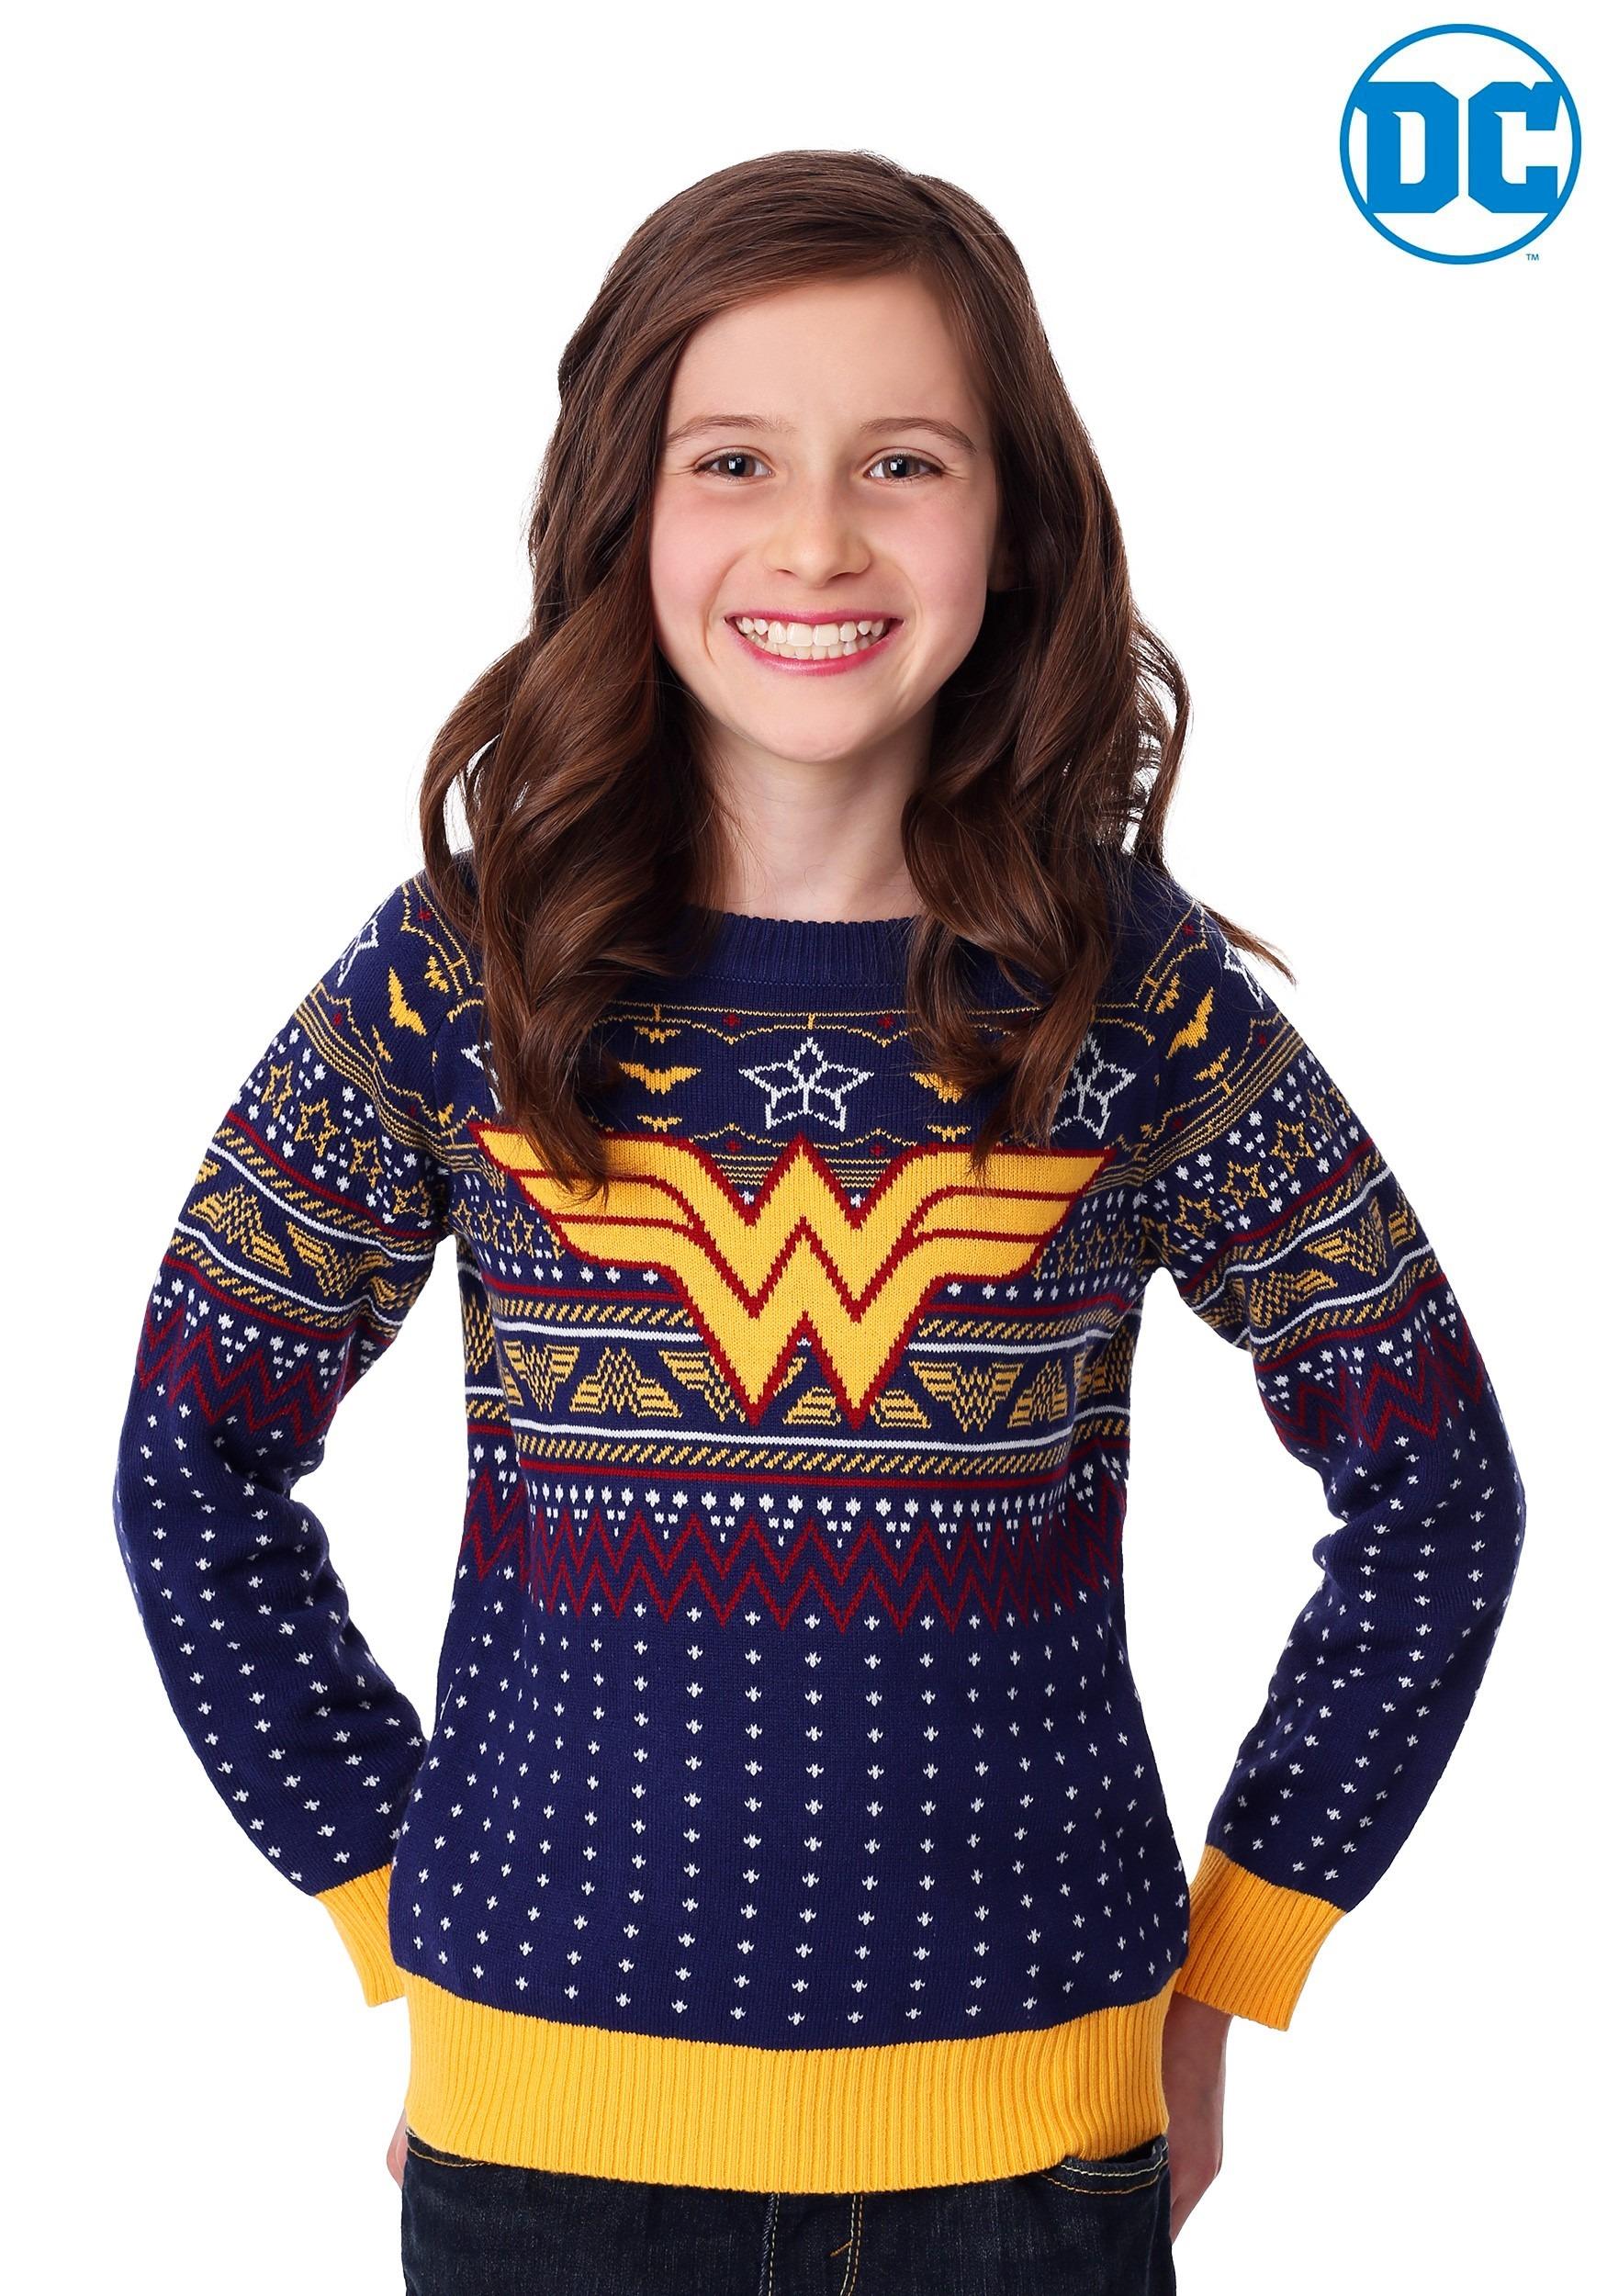 Ugly Christmas Sweater Kids.Child Wonder Woman Navy Ugly Christmas Sweater